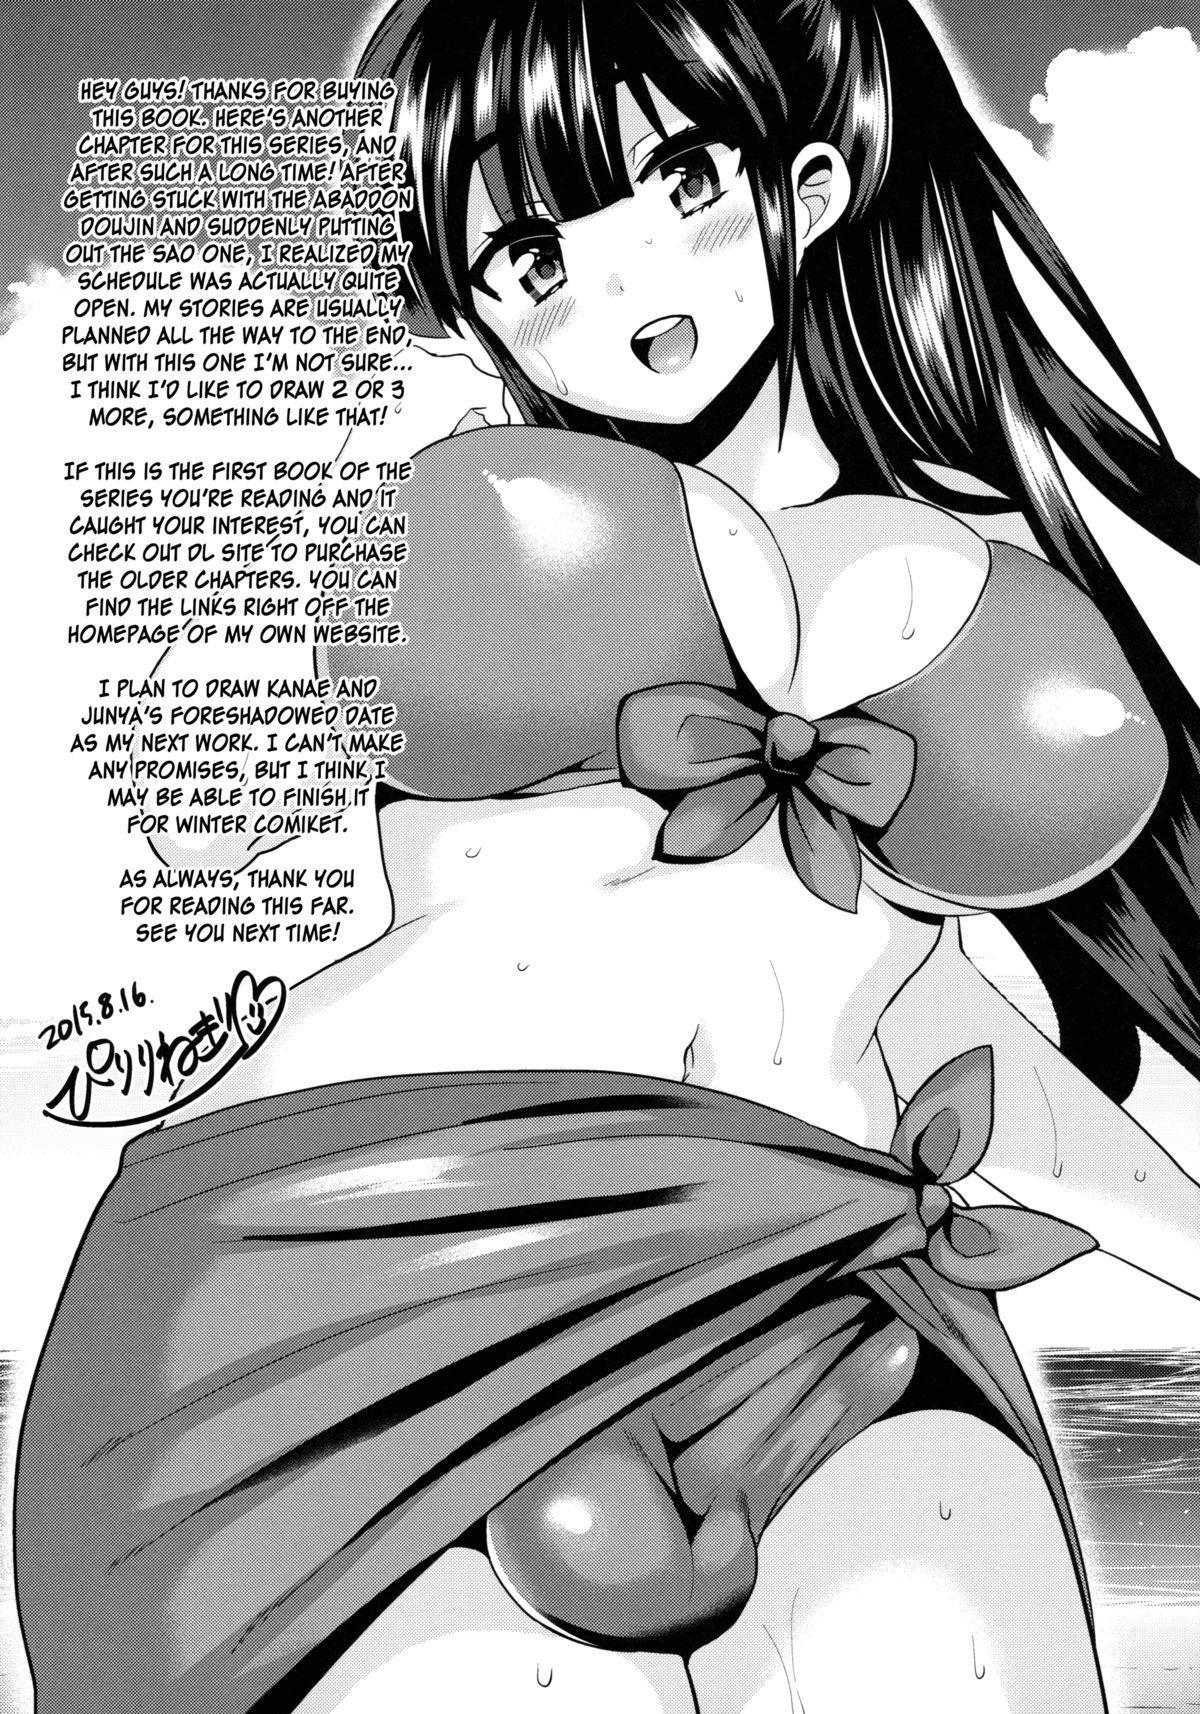 (C88) [Oshiruko Kan (Piririnegi)] Futanari! Oshioki Time 3 ~Shounen Saichoukyou Hen~   Futanari! Punishment Time 3 ~Boy's Retraining Chapter~ [English] =SW= 31